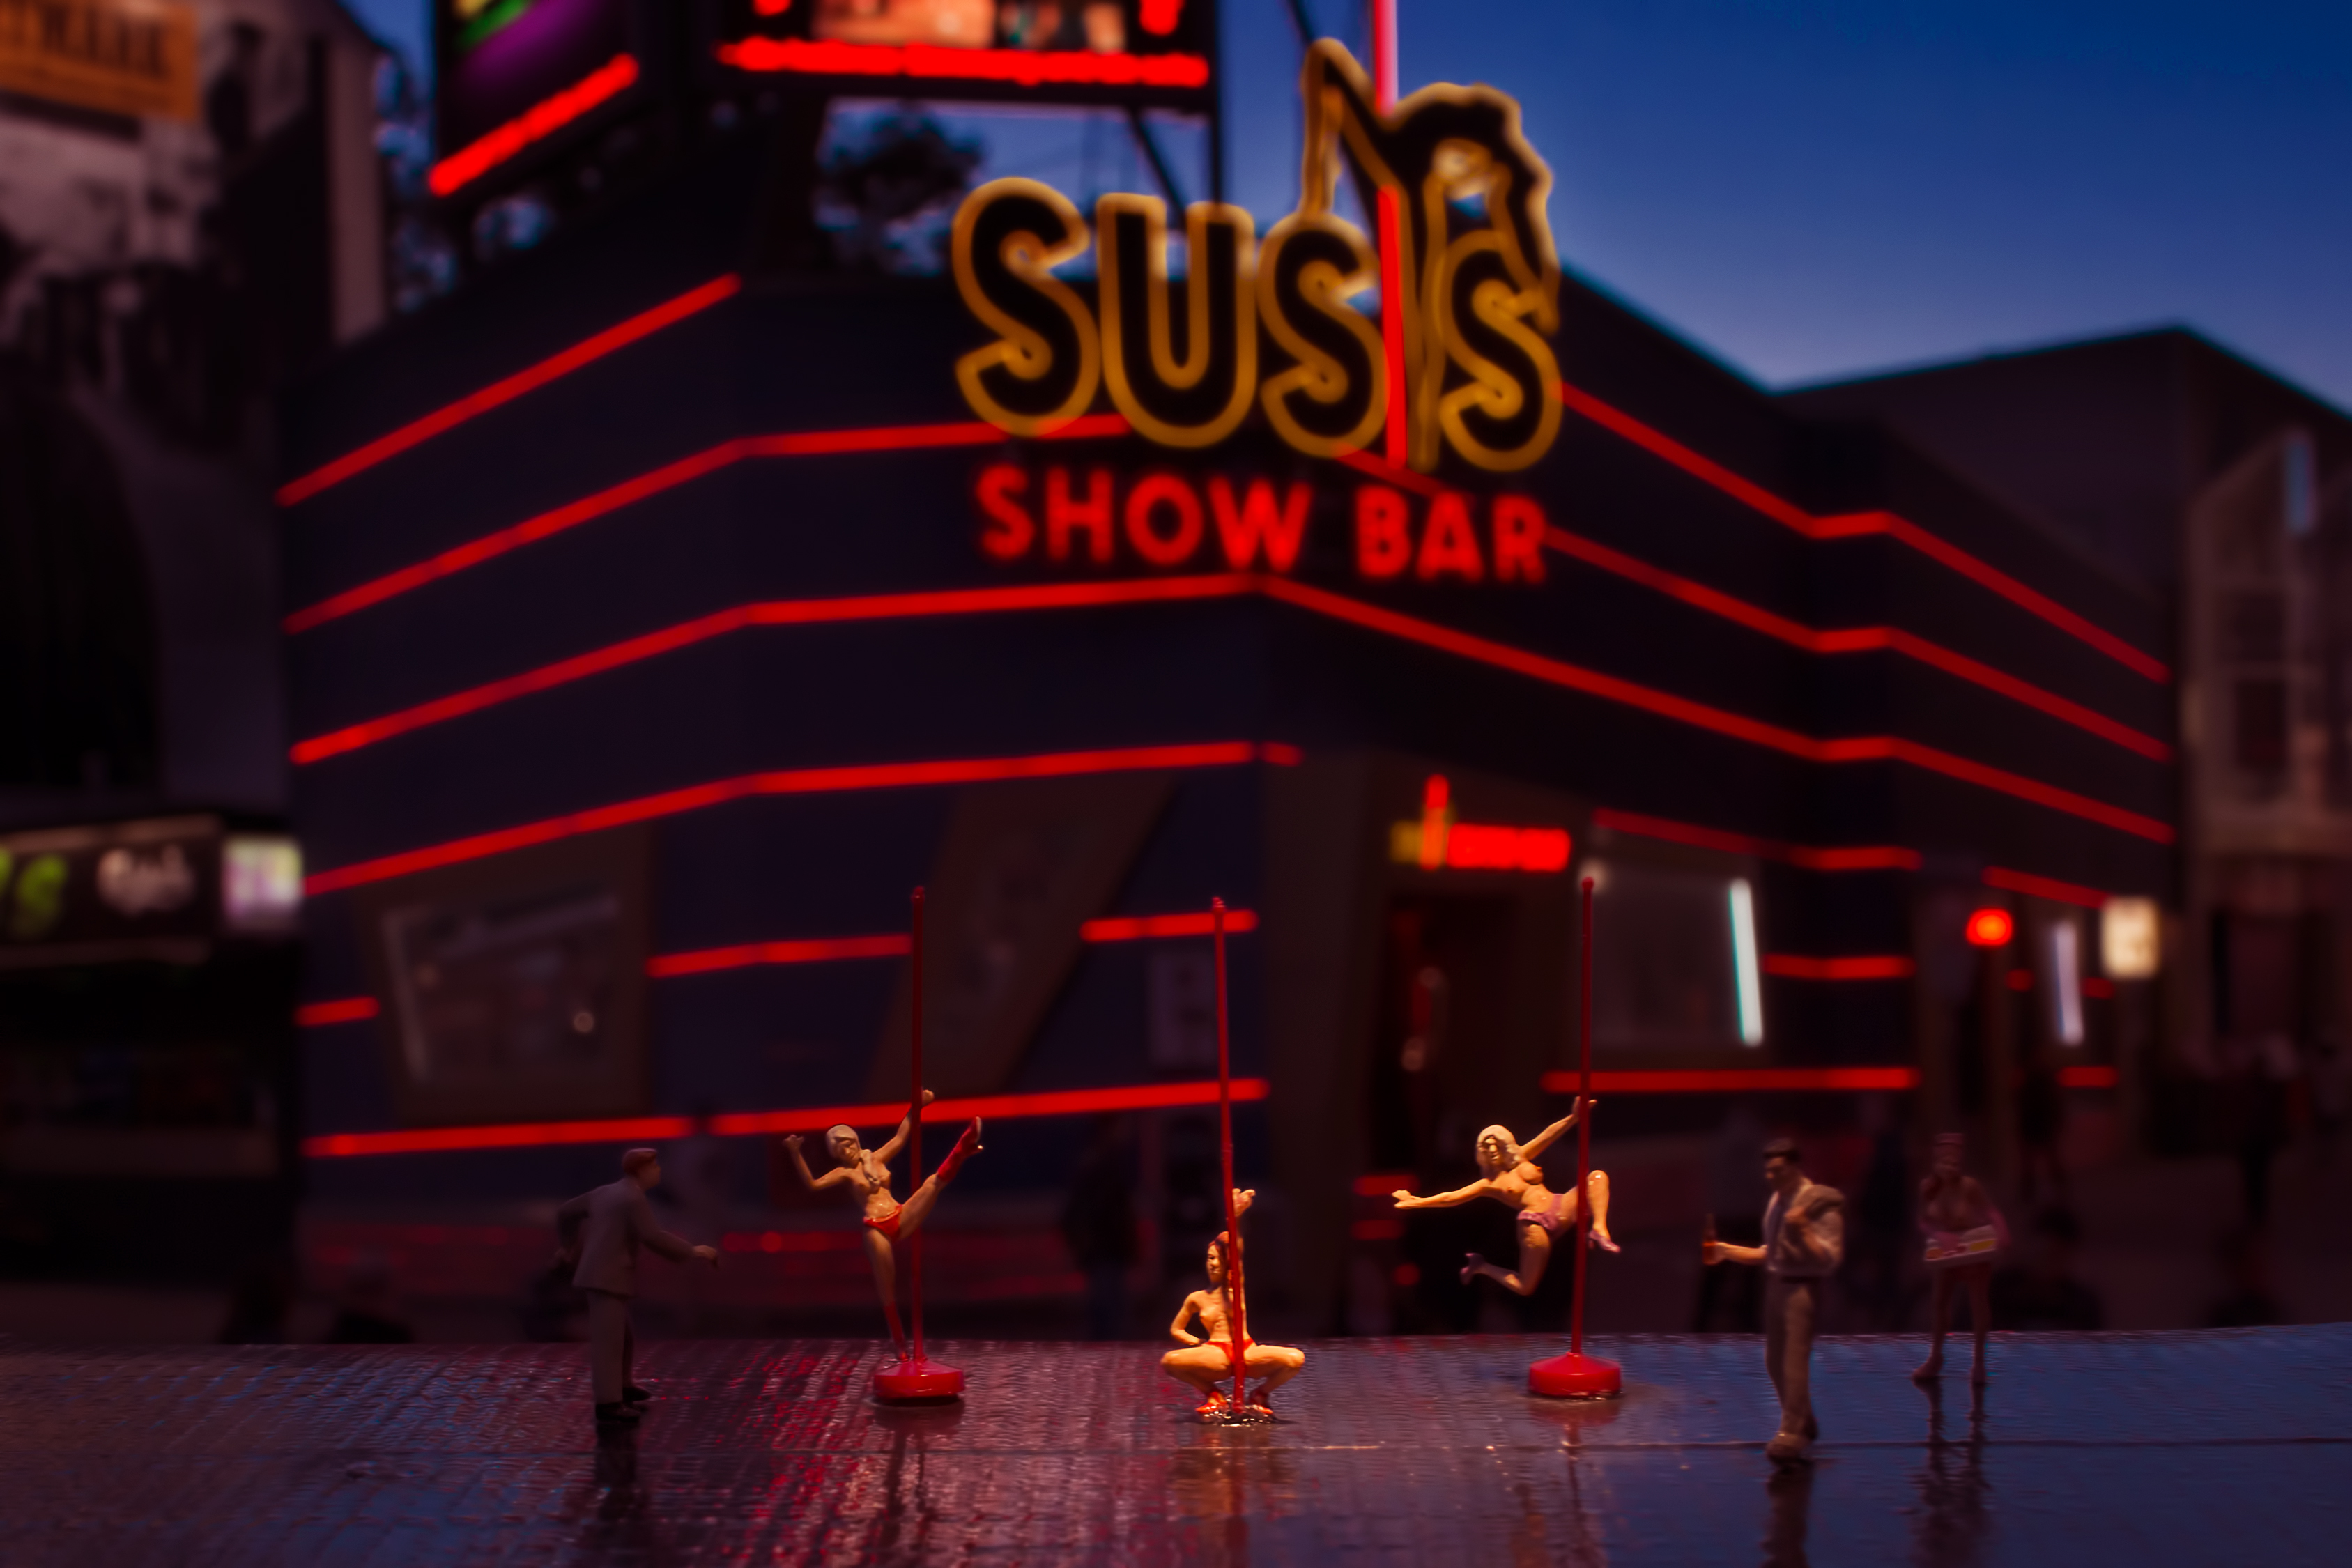 Kiez-Susis Showbar